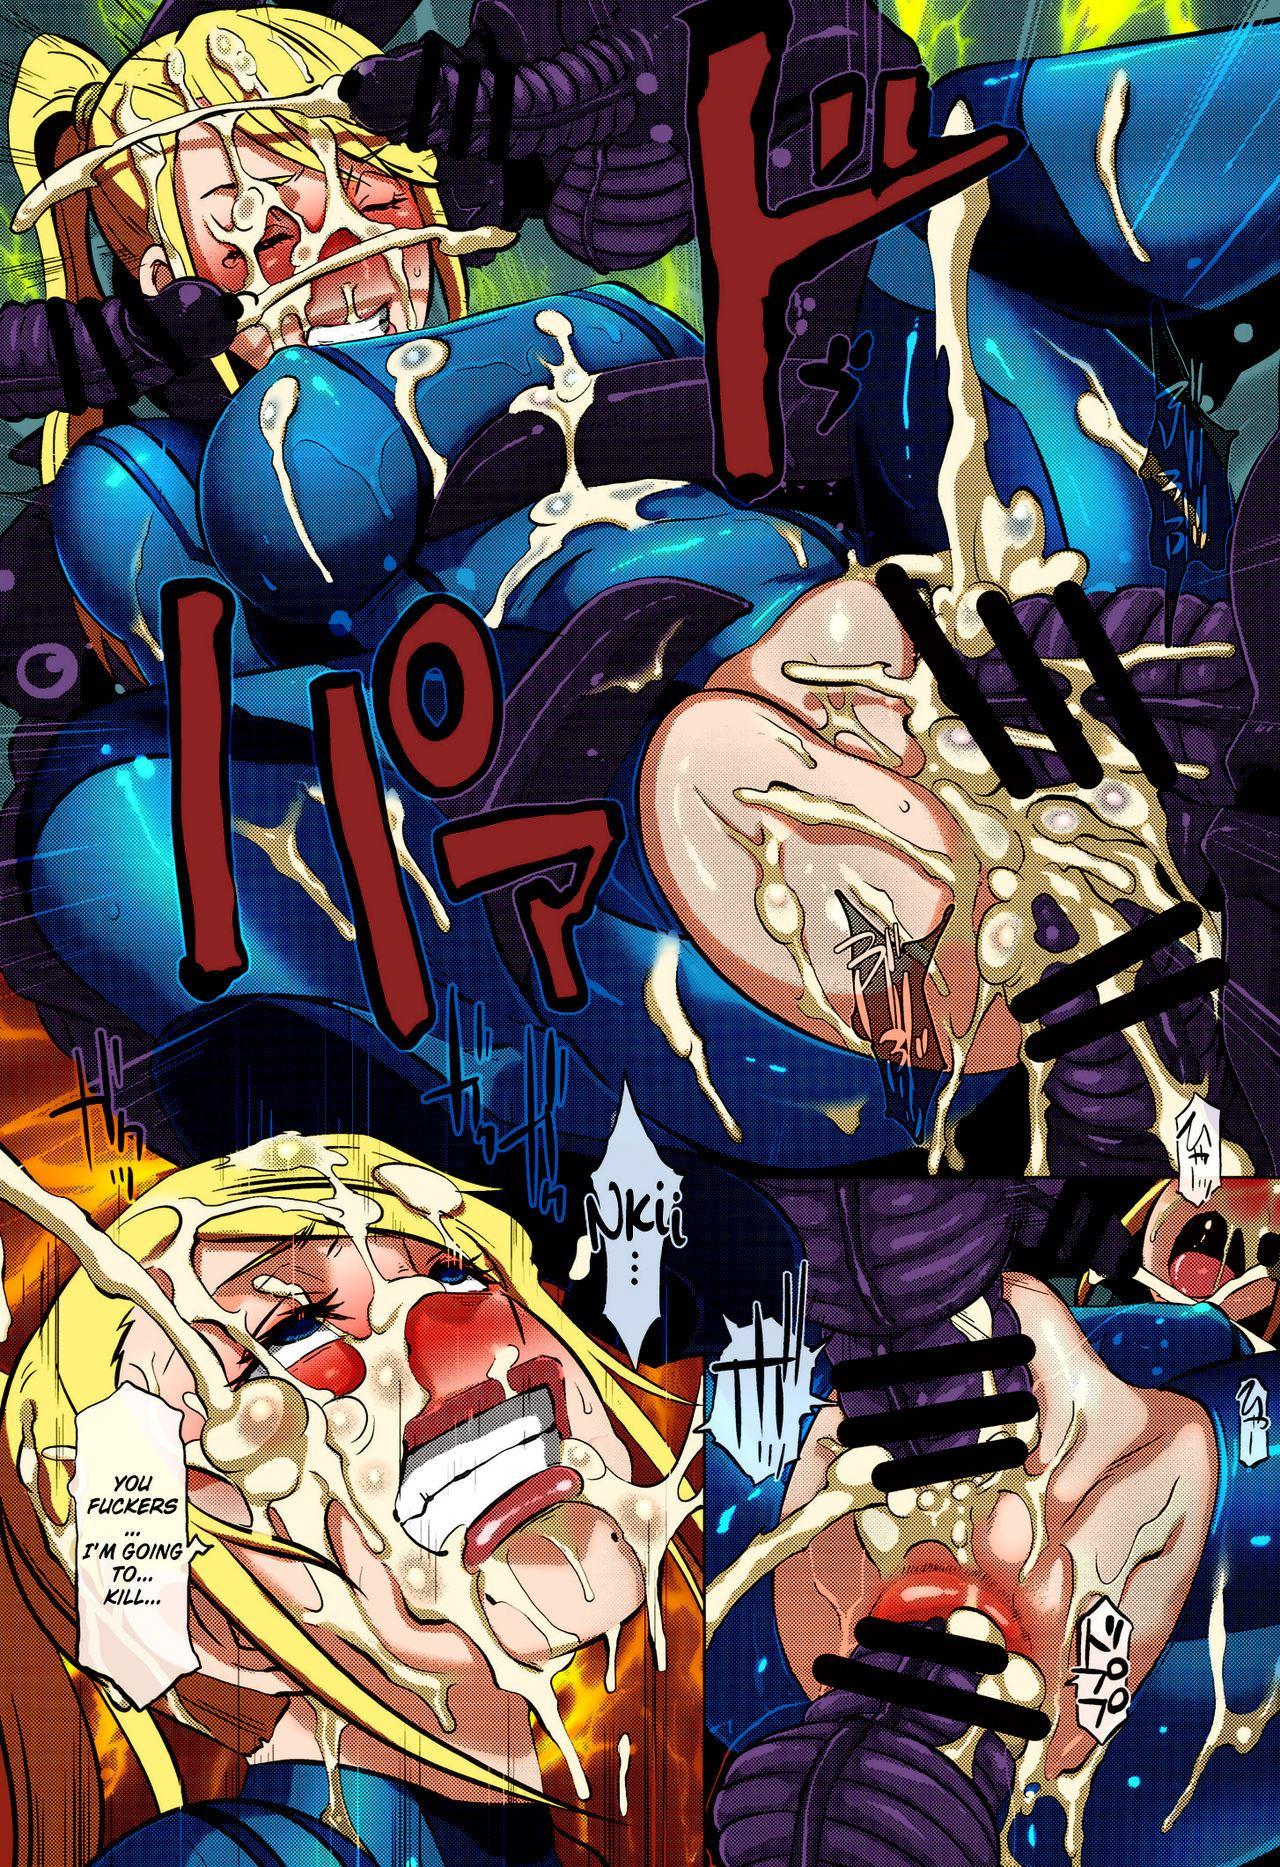 Metroid XXX English hentai comics Hentai Online porn manga and Doujinshi